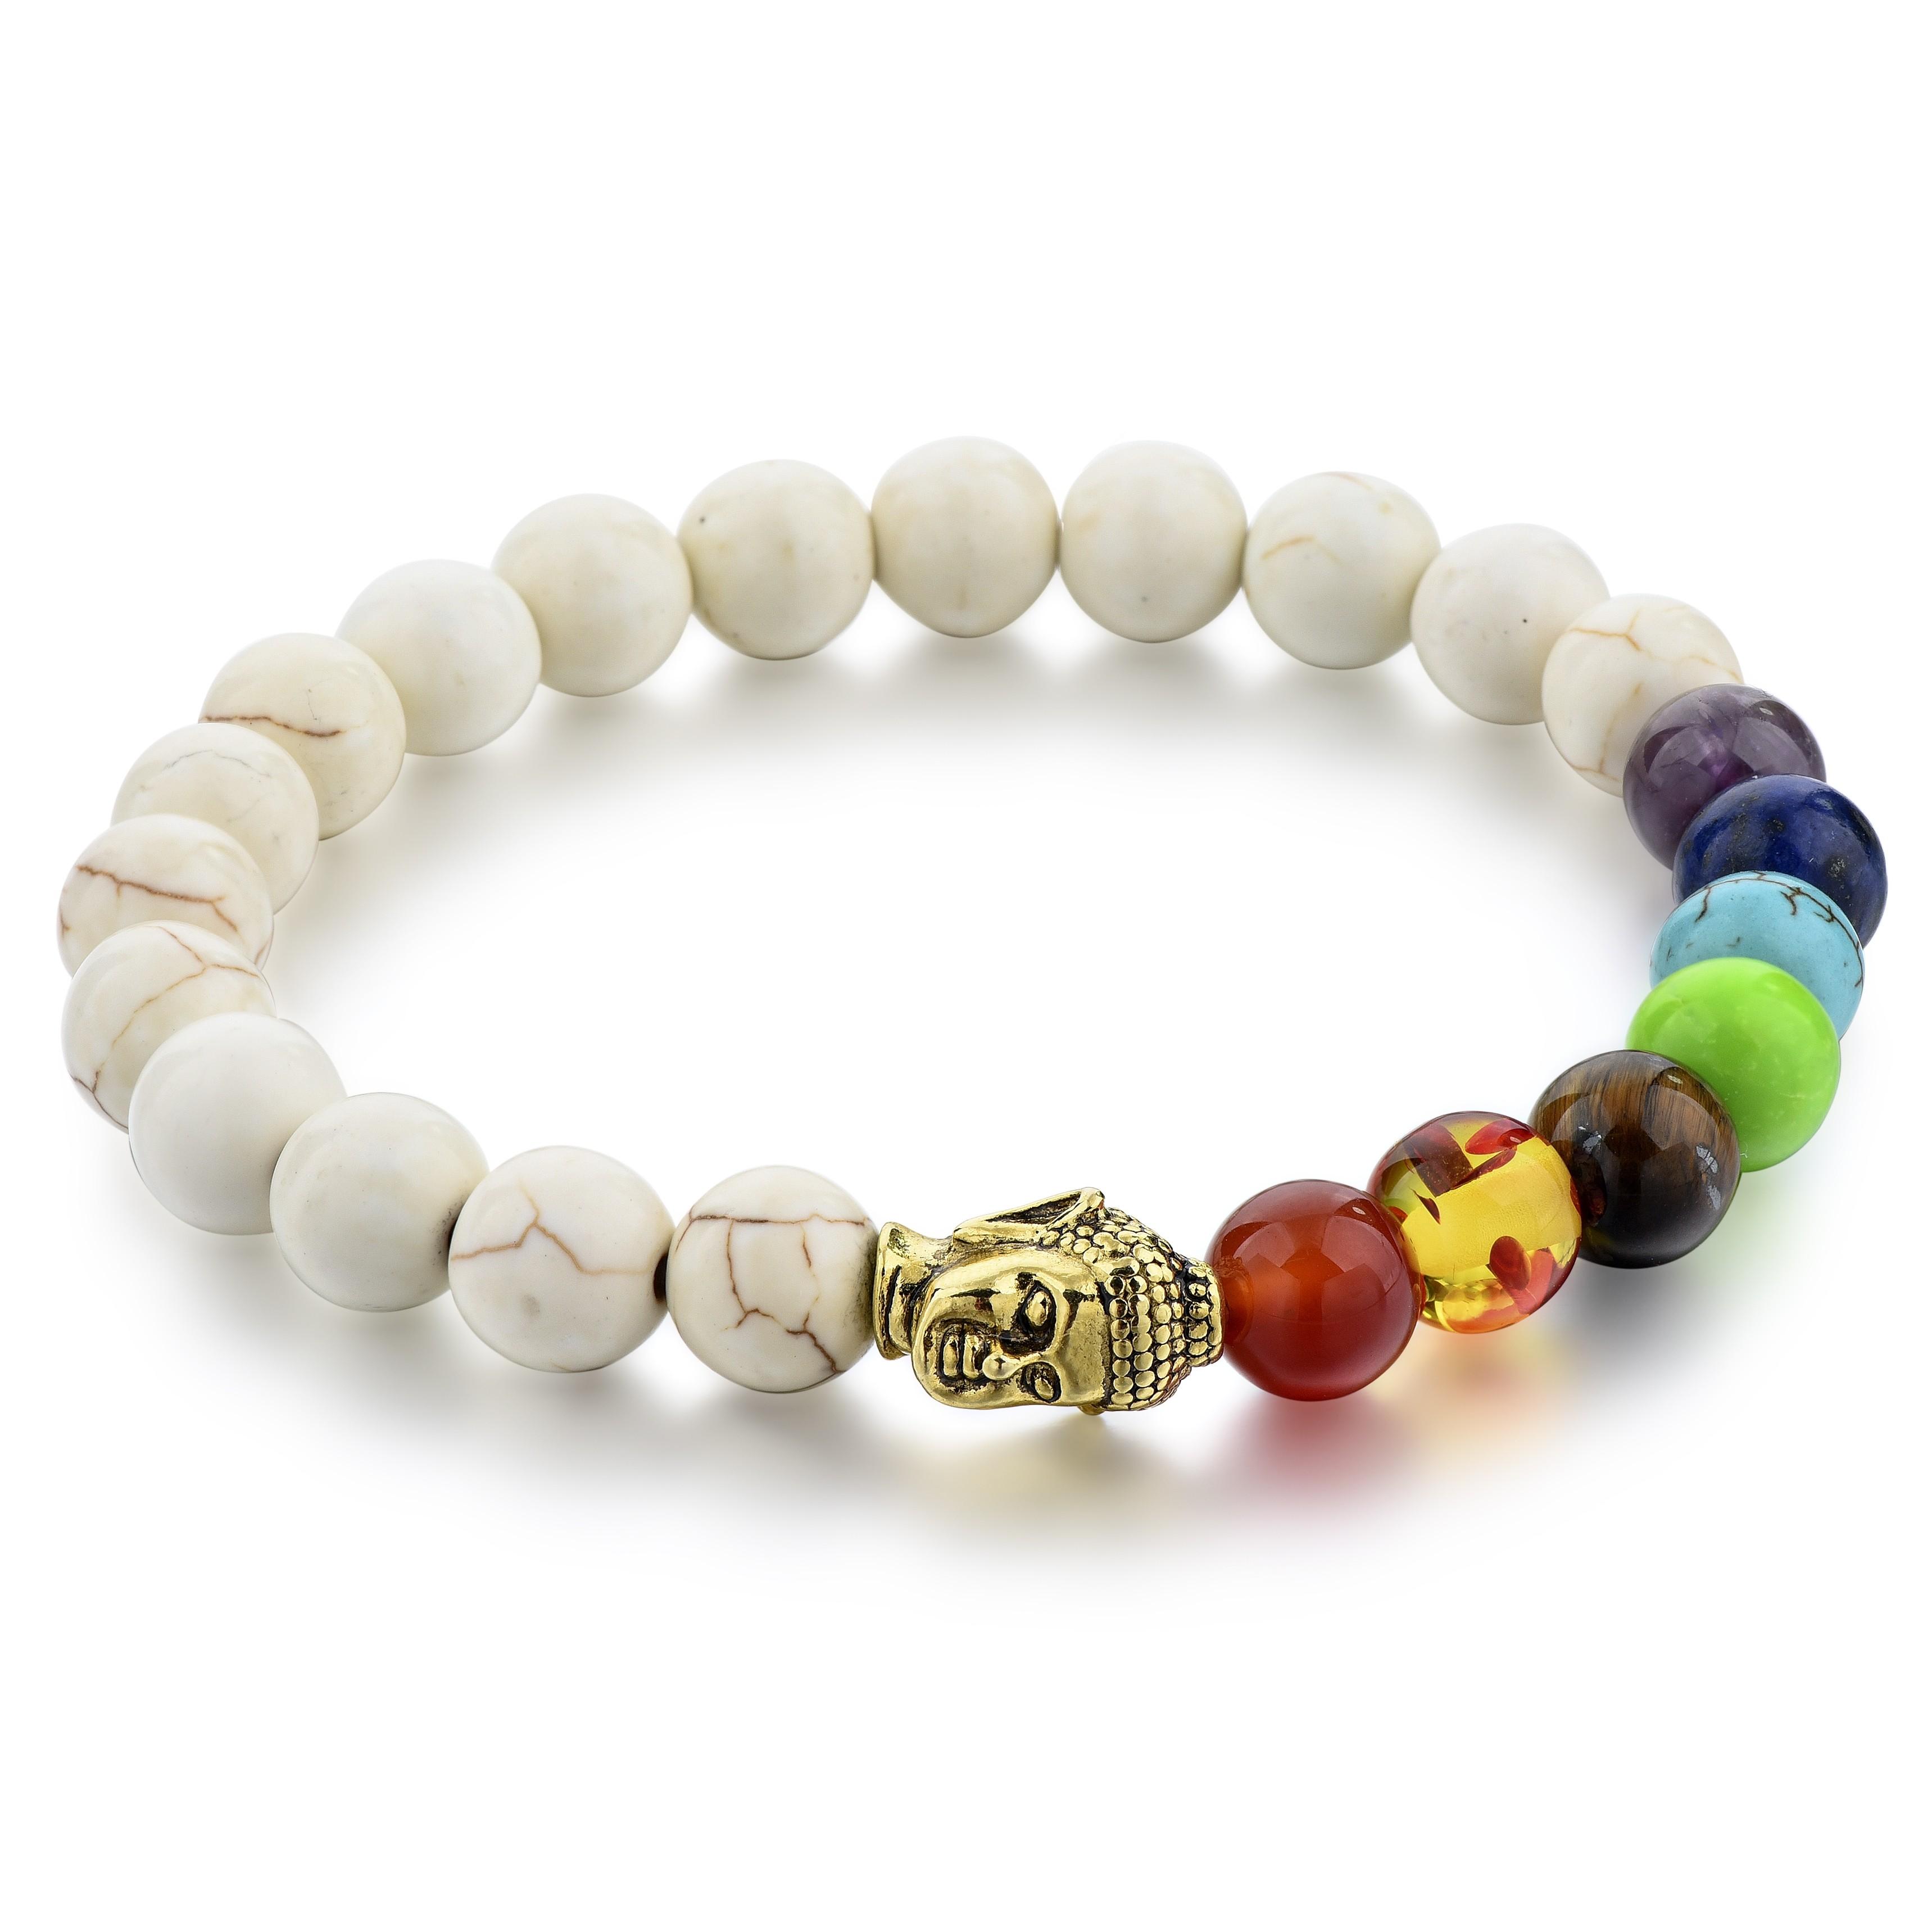 Bracelet howlite blanche et 7 chakras - bouddha